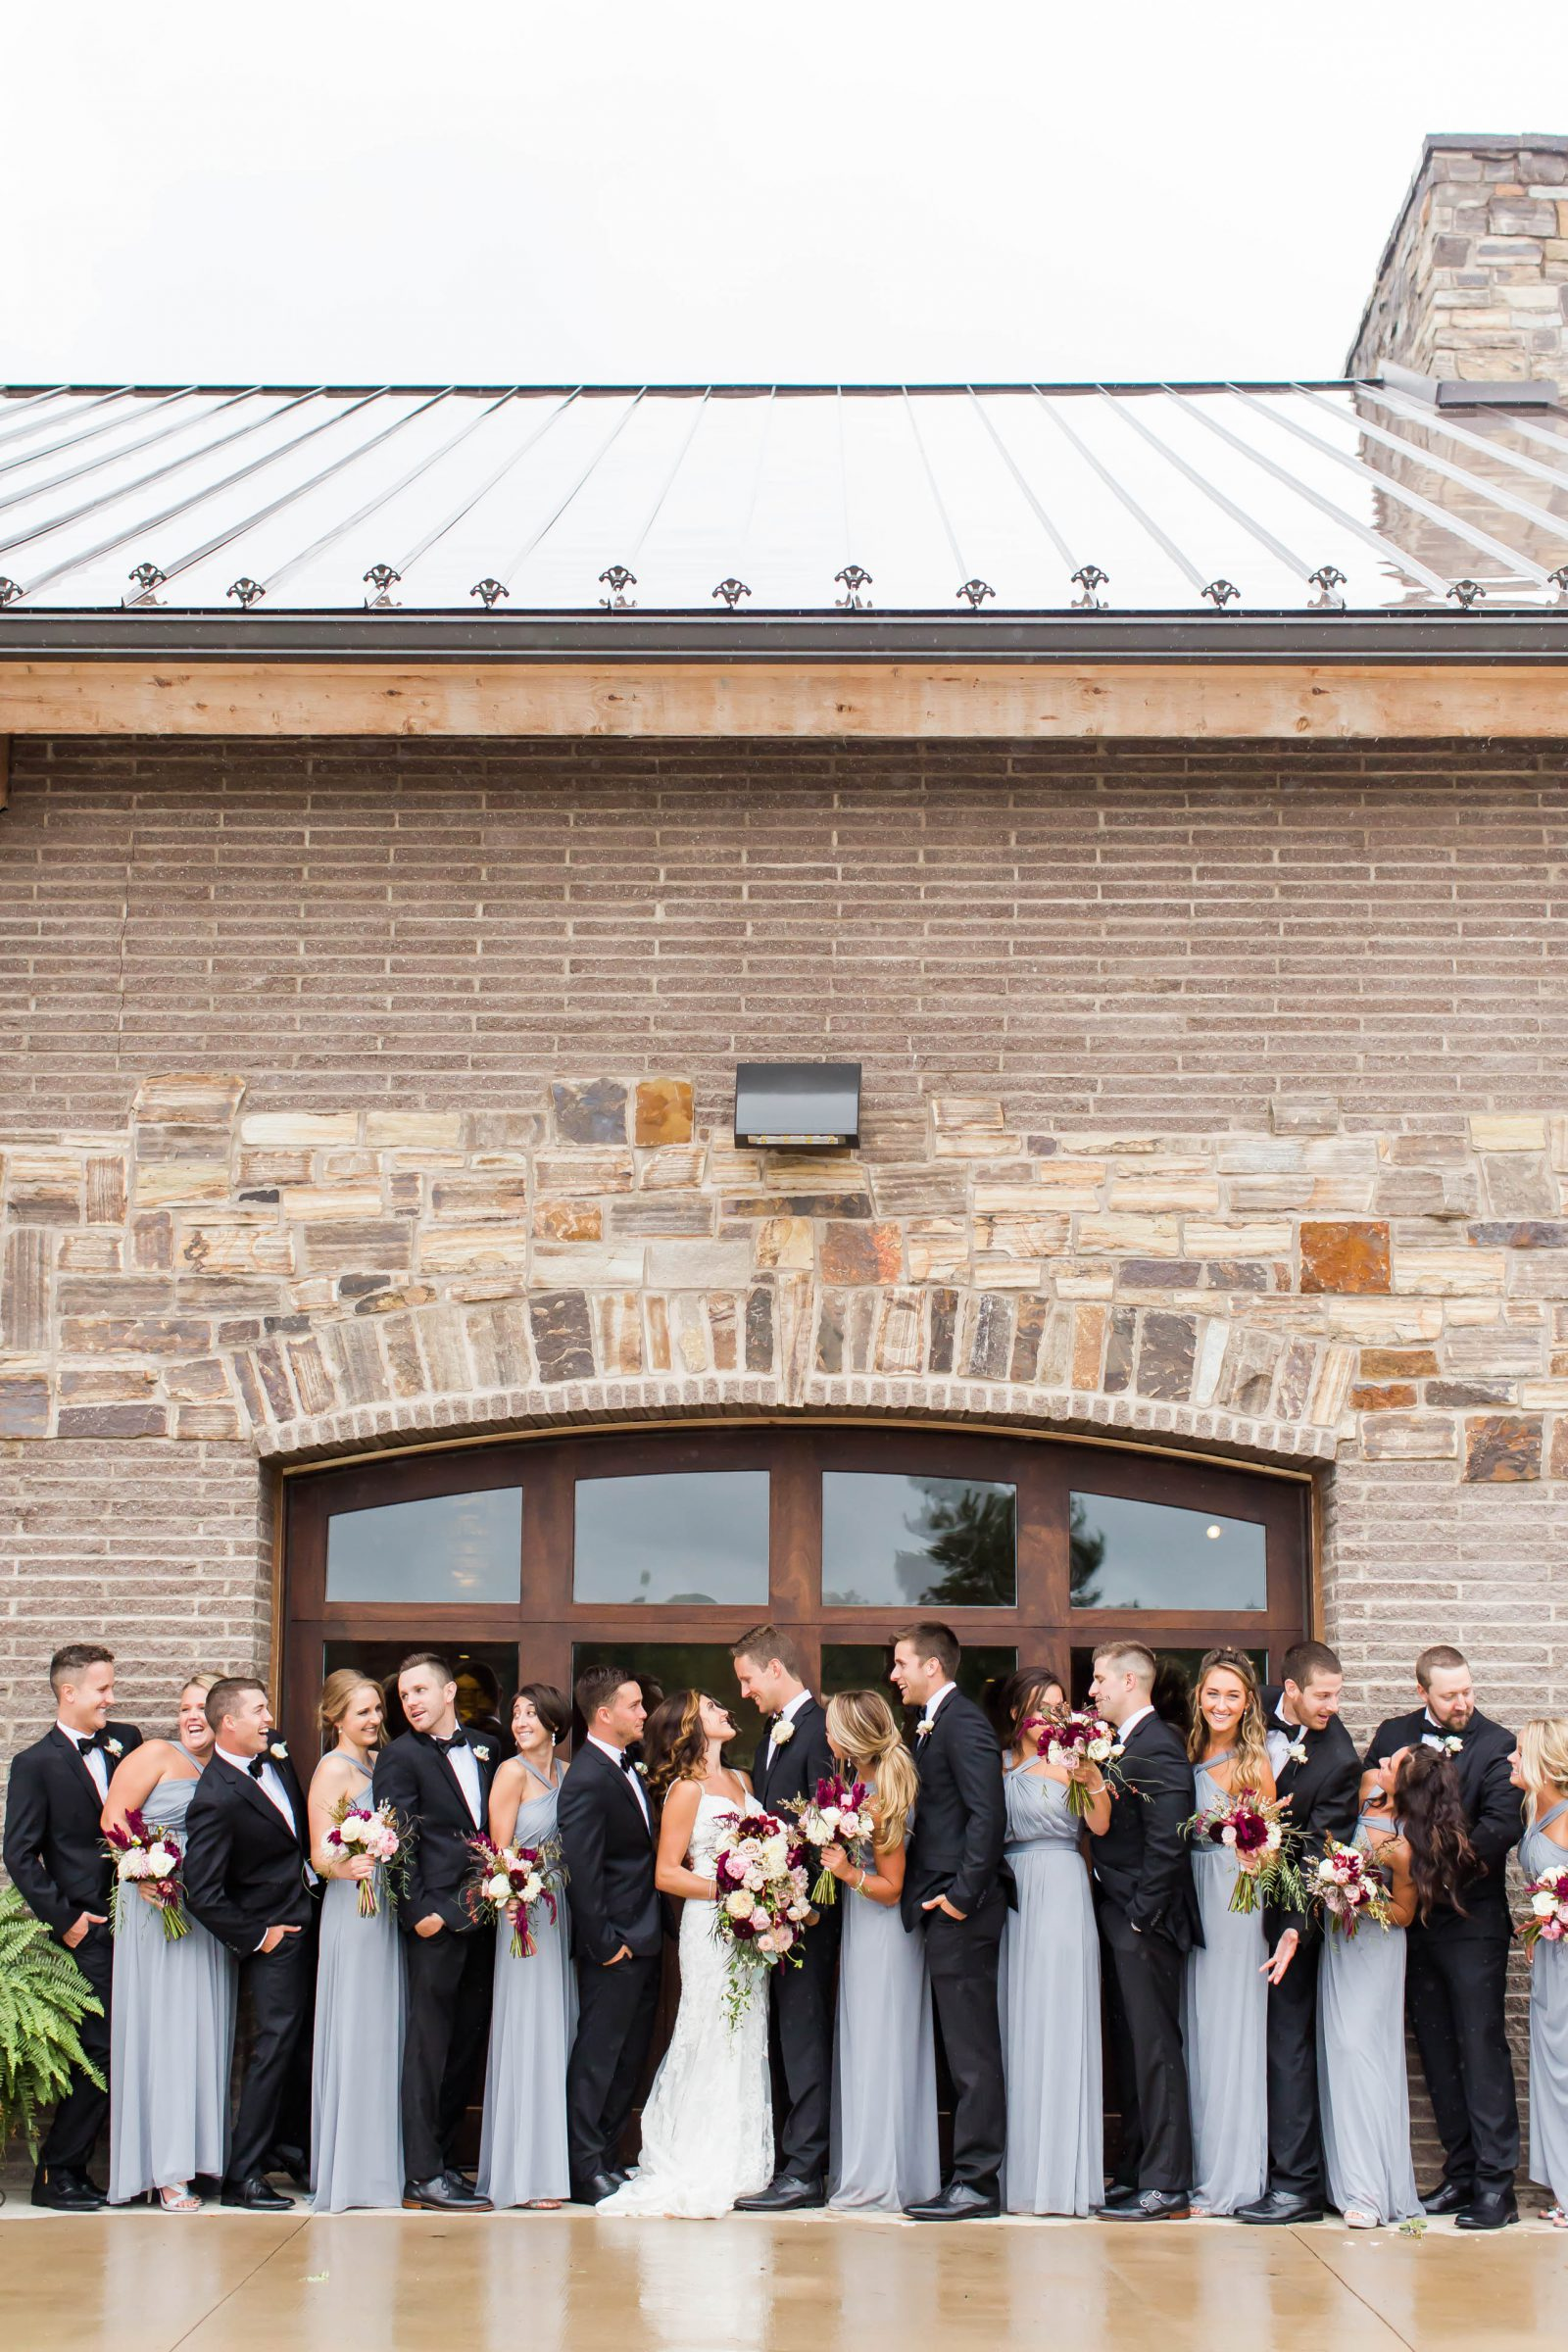 sunny-hill-wedding-venue-loren-jackson-photography-40